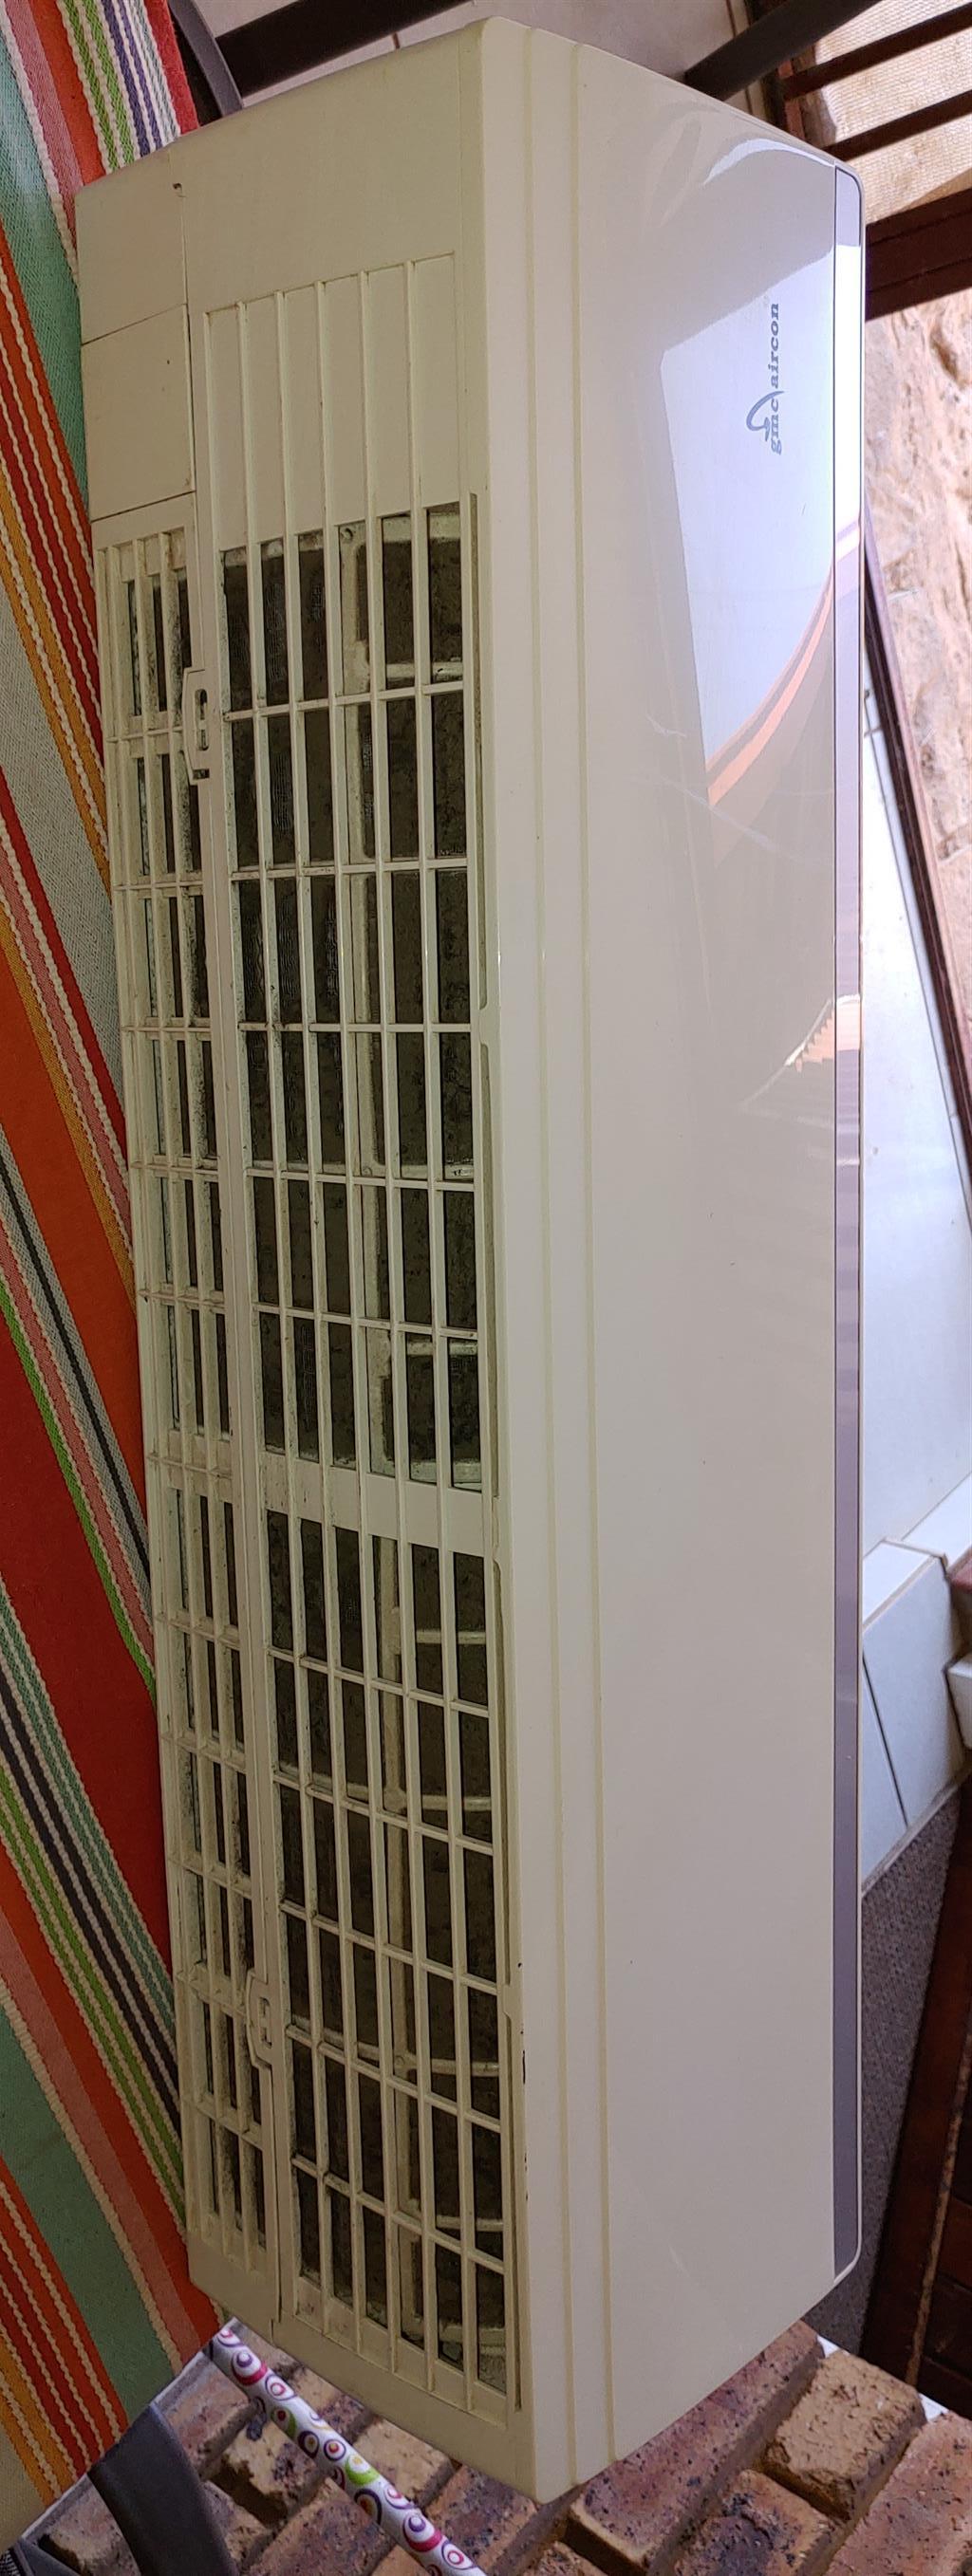 GMC split aircon for sale